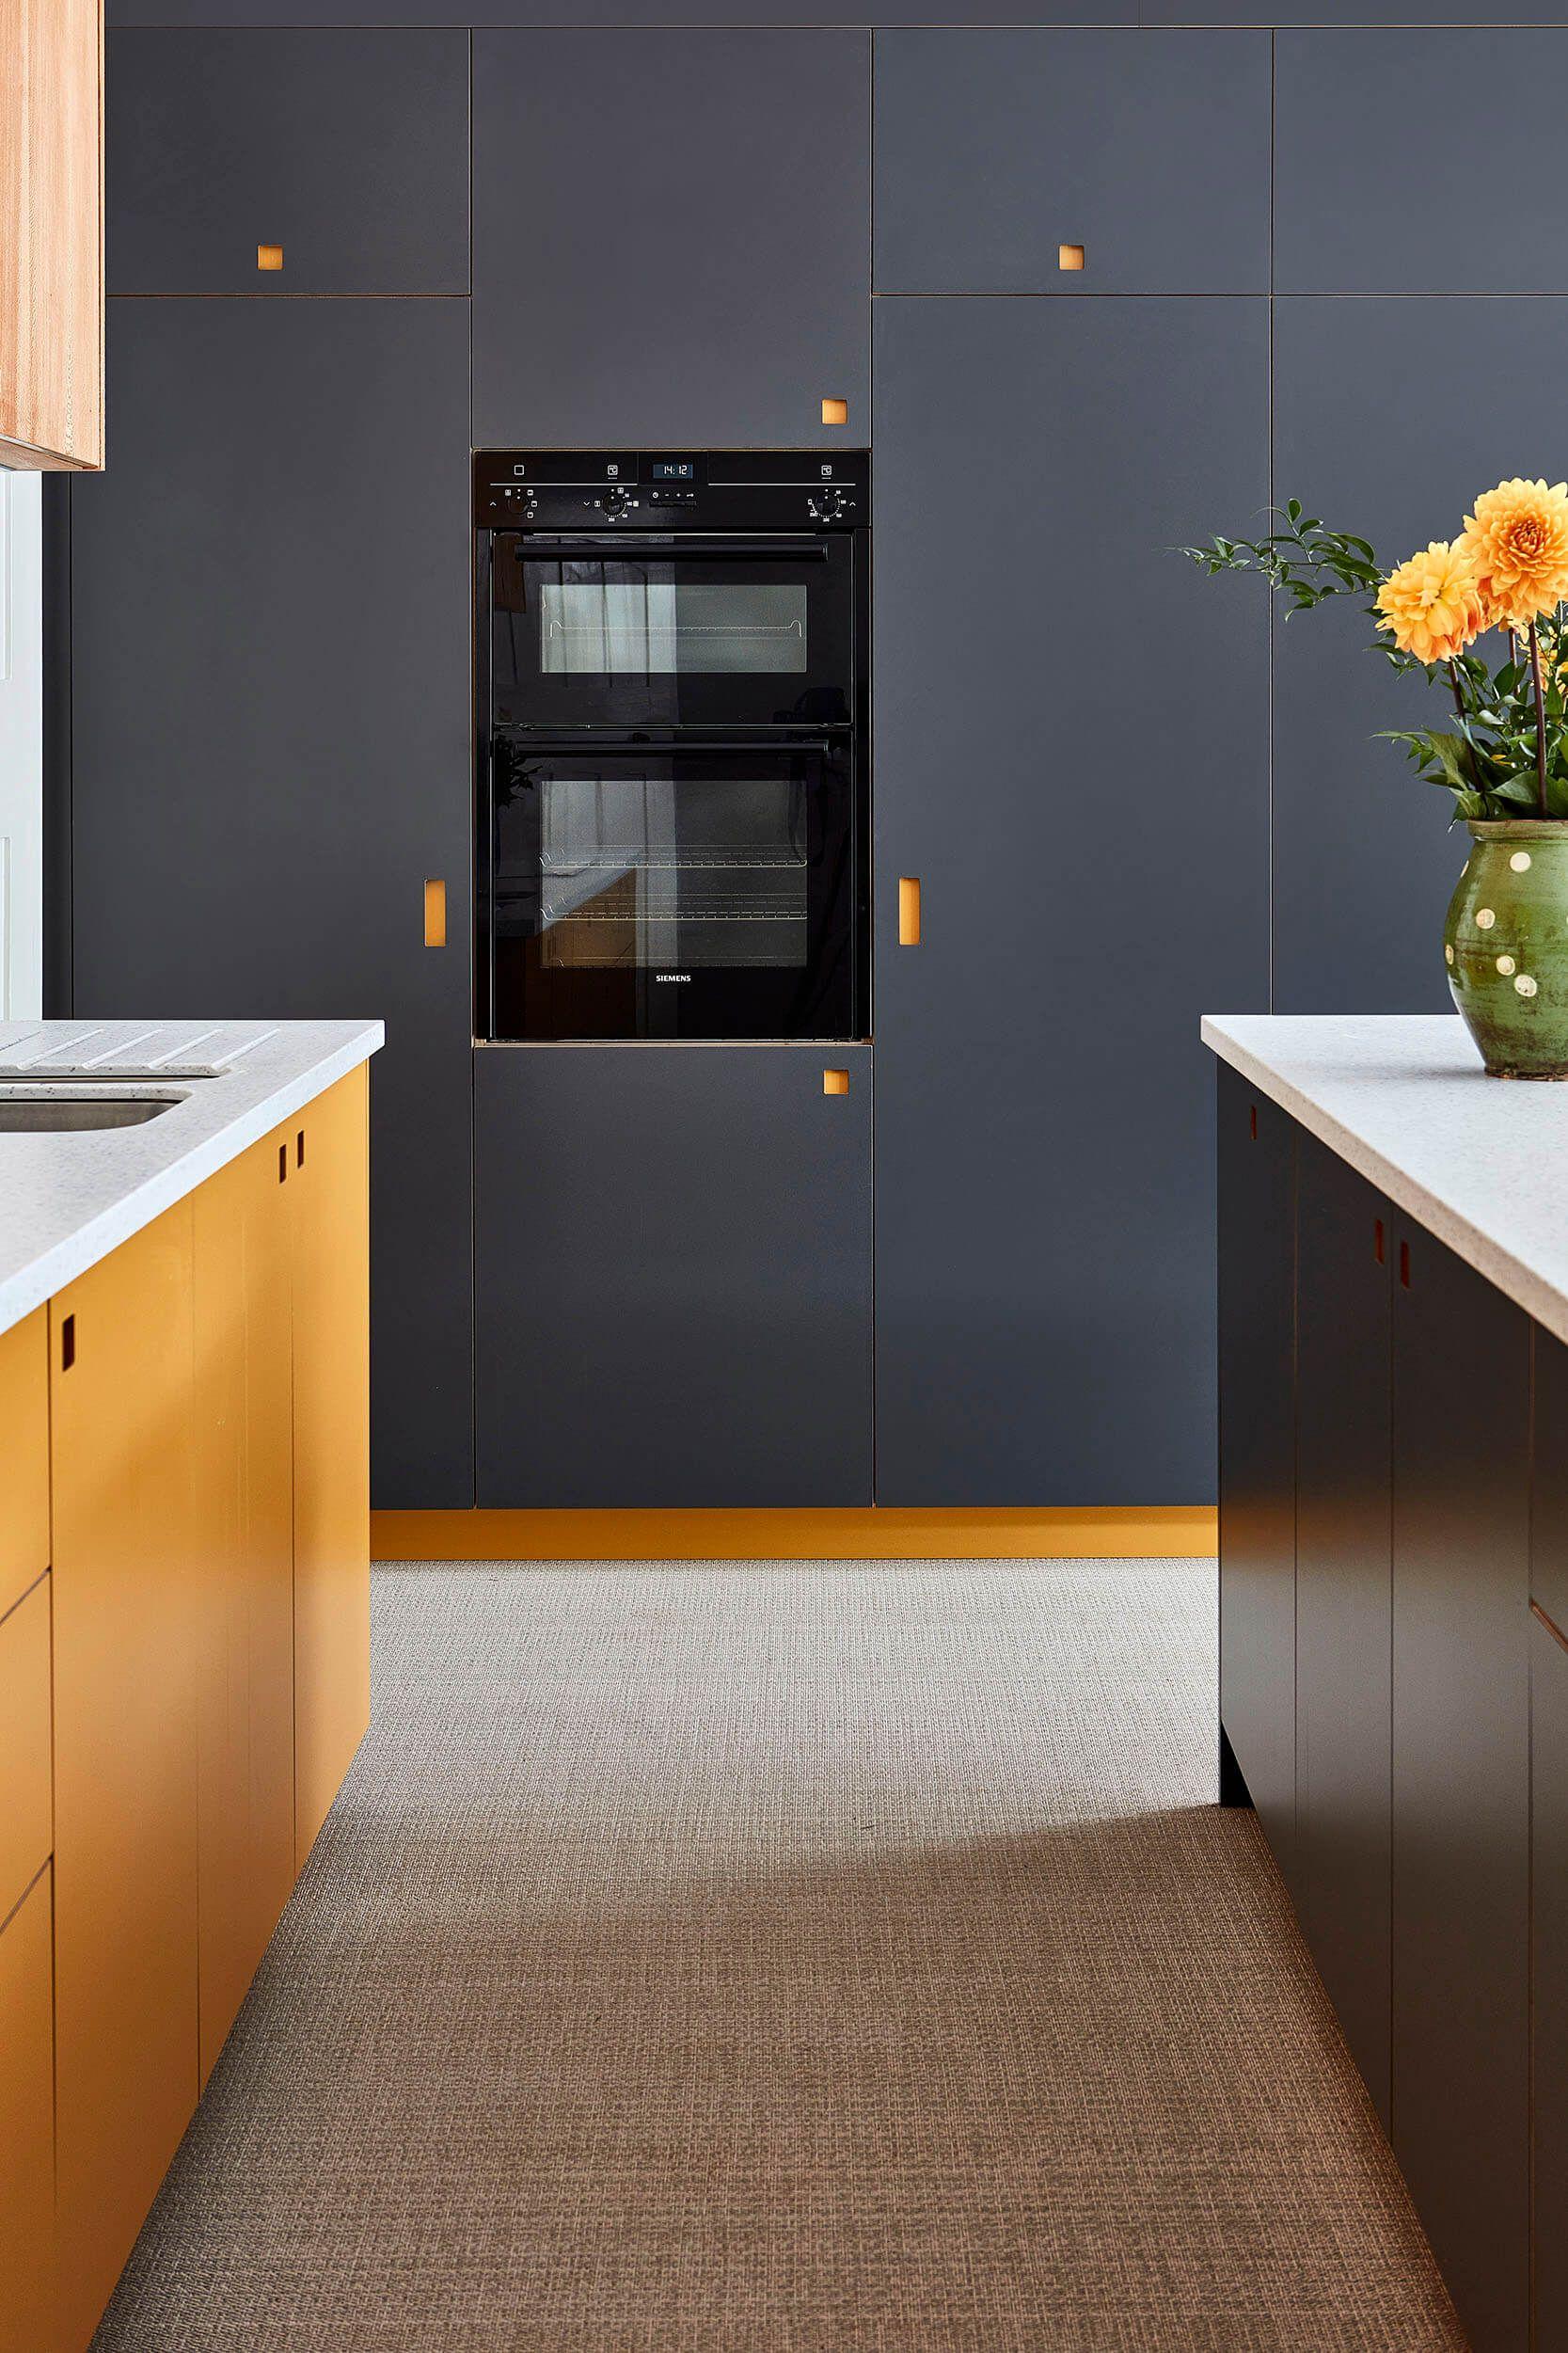 Mustard Yellow And Dark Grey Kitchen Cabinets Modern Kitchen Furniture Dark Grey Kitchen Cabinets